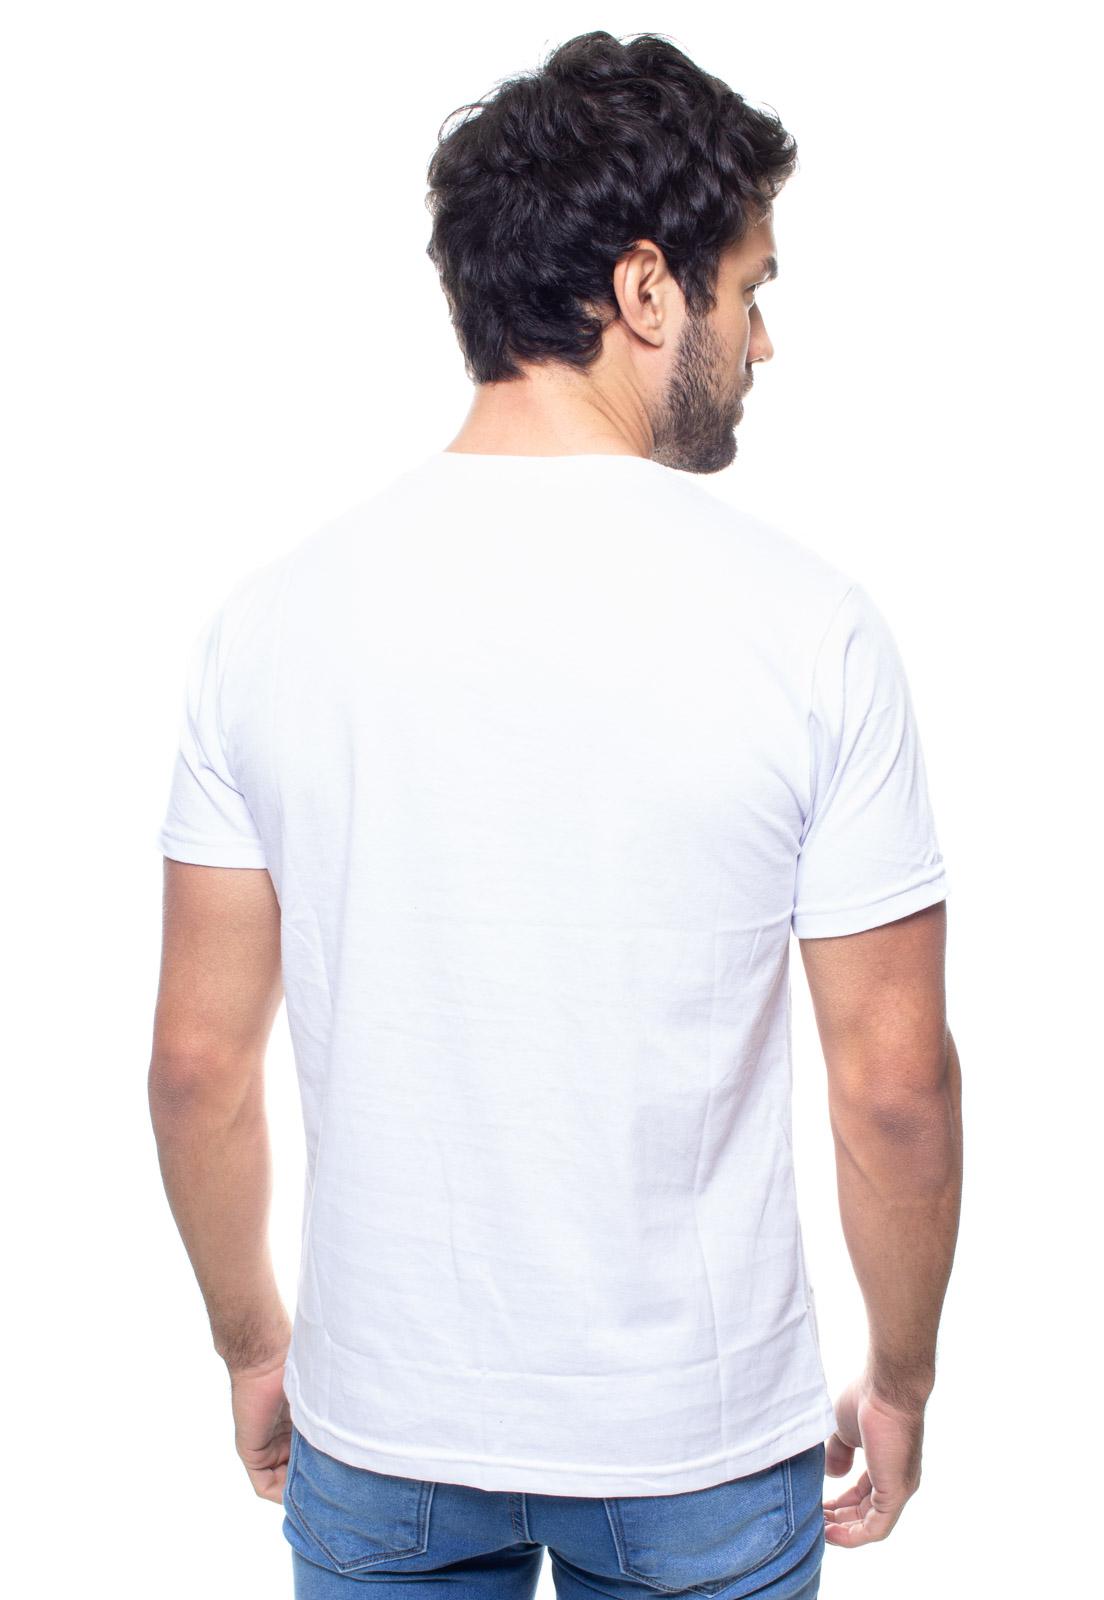 Camiseta Masculina Manga Curta Crocker - 47993  - CROCKER JEANS